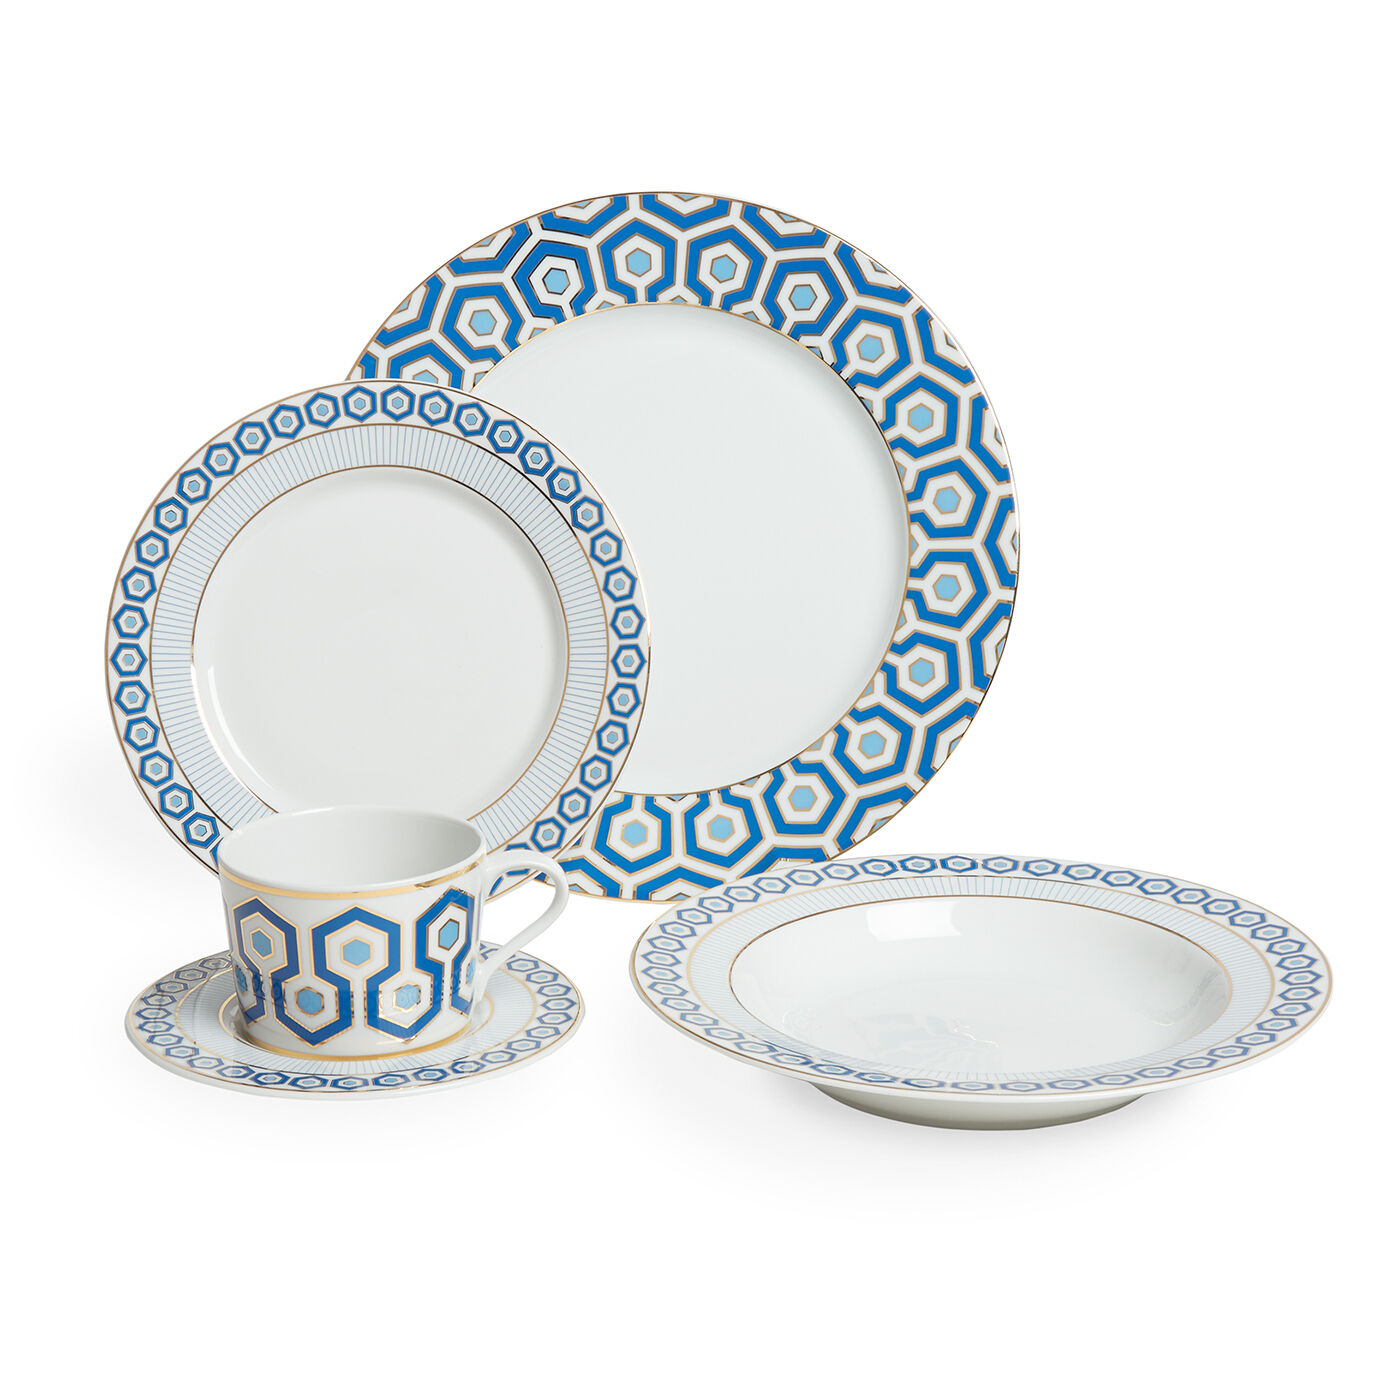 dinnerware sets newport fivepiece dinner set - Dishware Sets